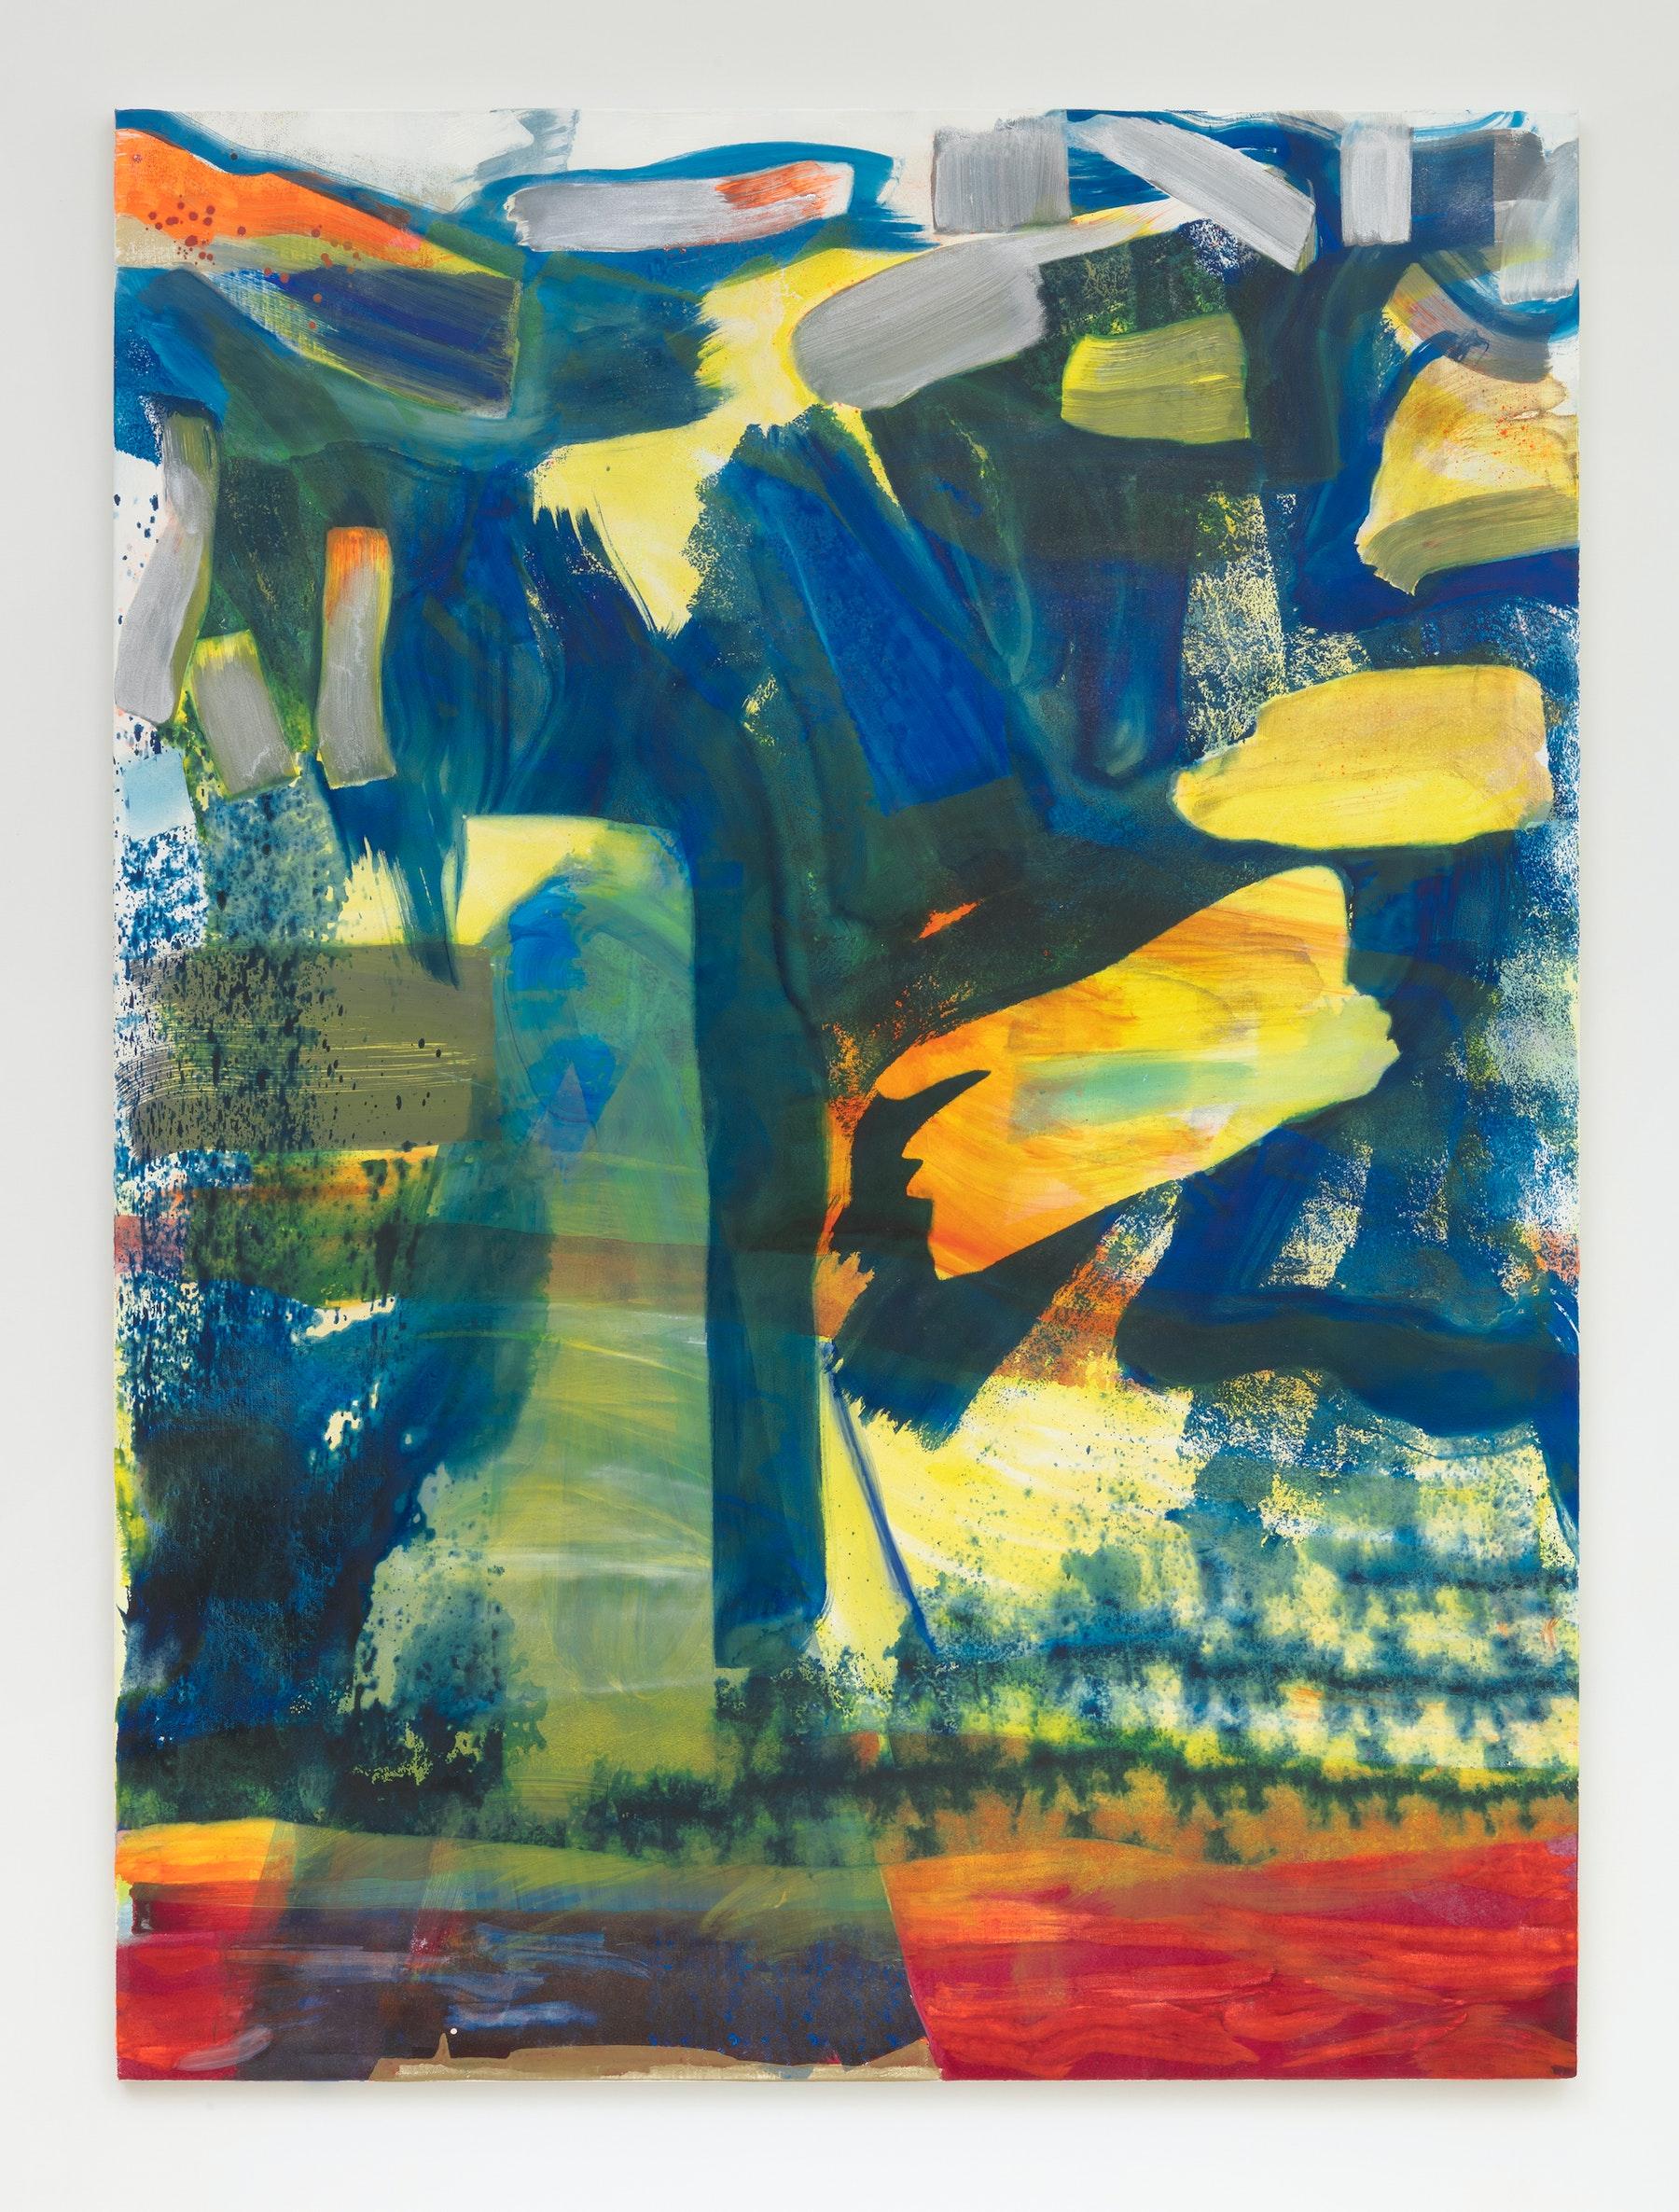 "Monique Van Genderen ""Untitled,"" 2020 Oil on linen 78 x 58"" [HxW] (198.12 x 147.32 cm) Inventory #VGE374 Courtesy of the artist and Vielmetter Los Angeles Photo credit: Robert Wedemeyer"